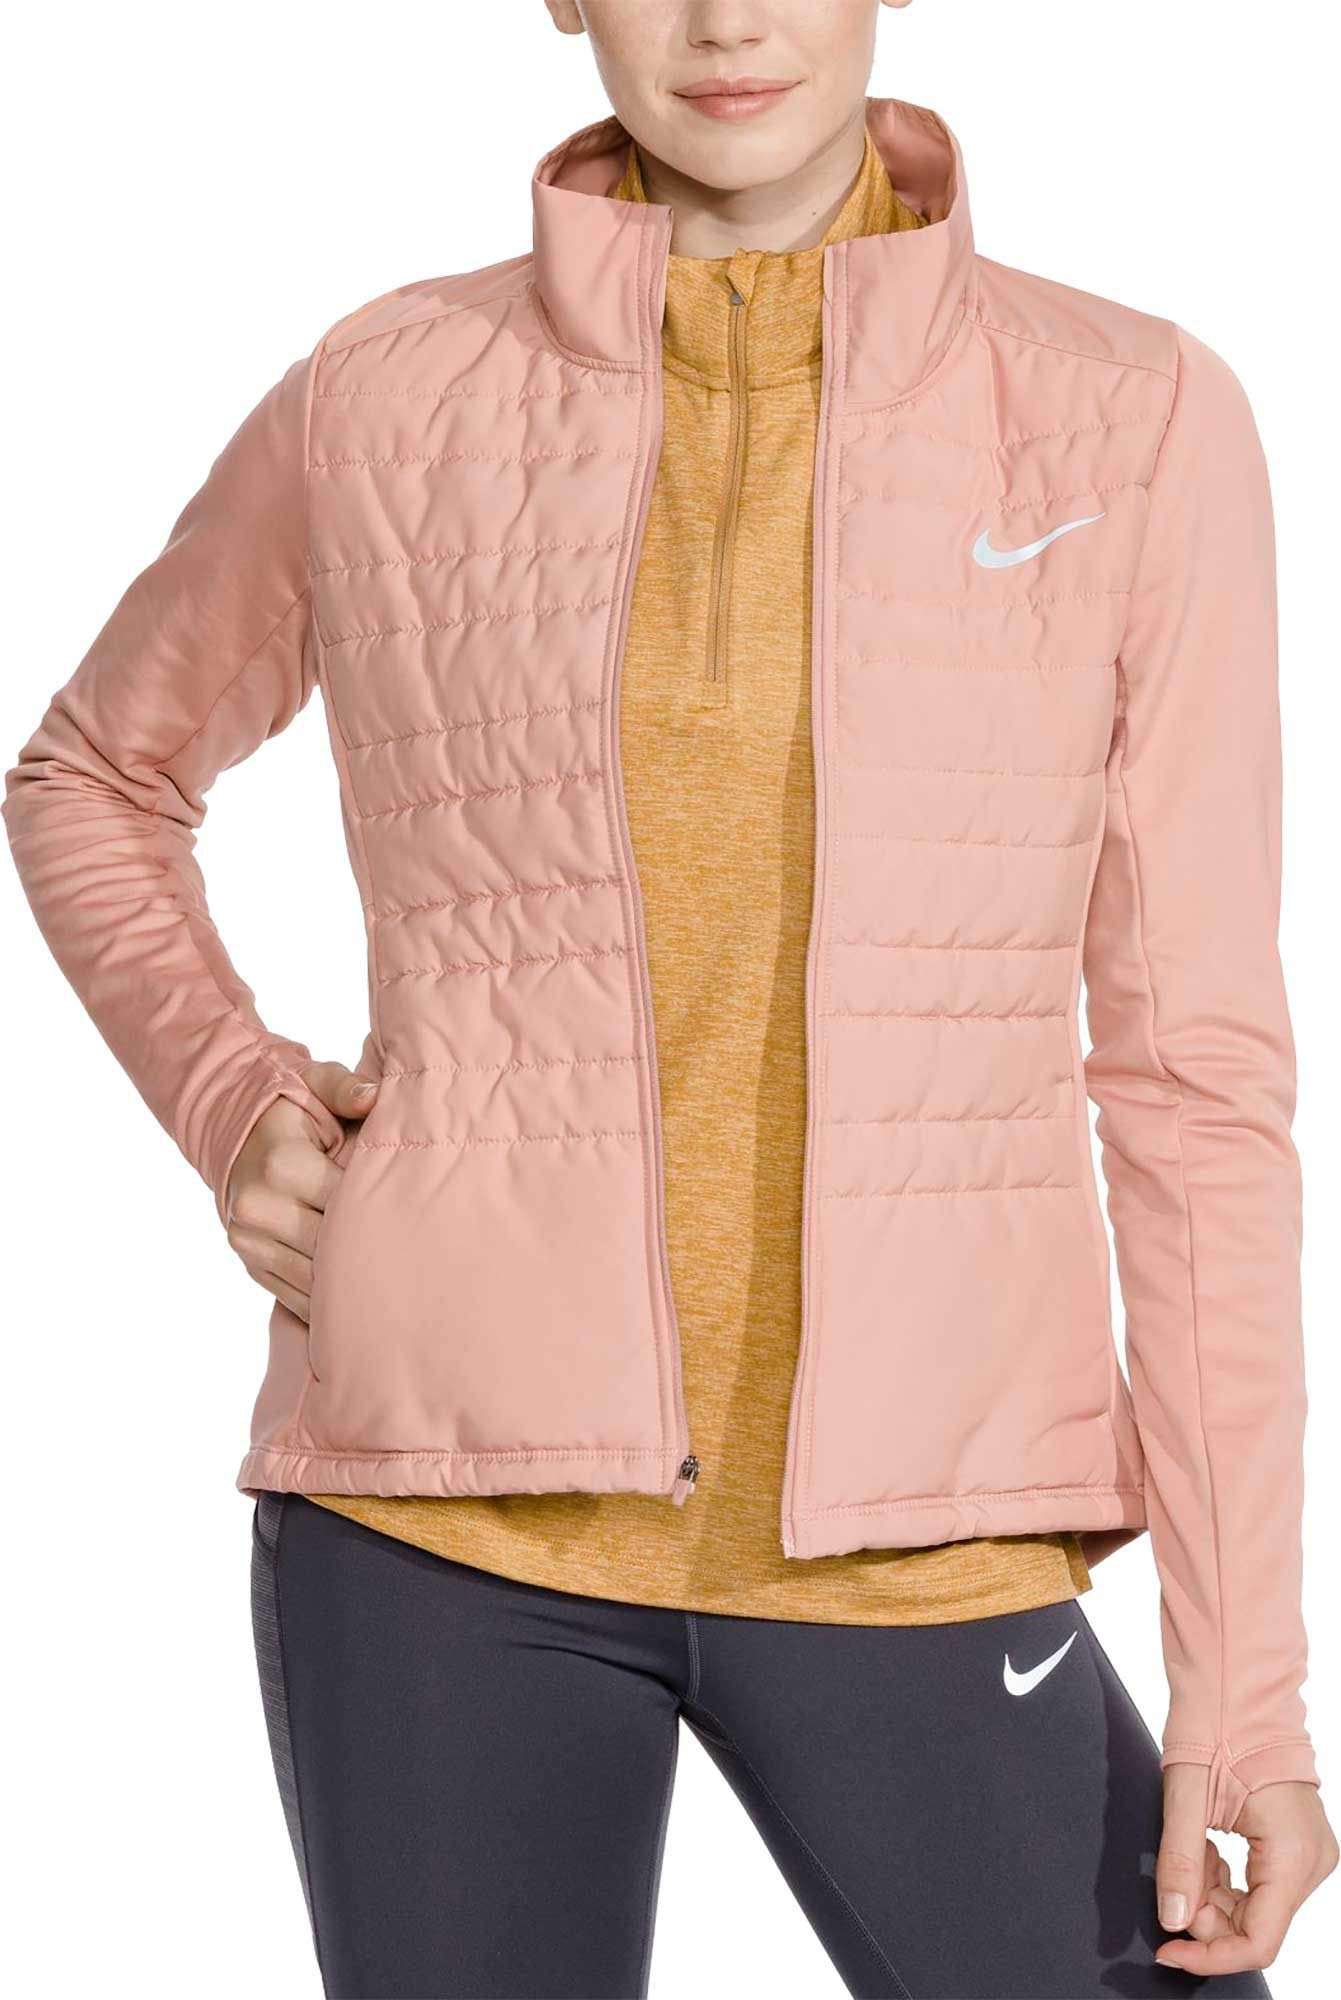 NIKE Women's Essential Full Zip Running Jacket (Rust Pink, Medium)